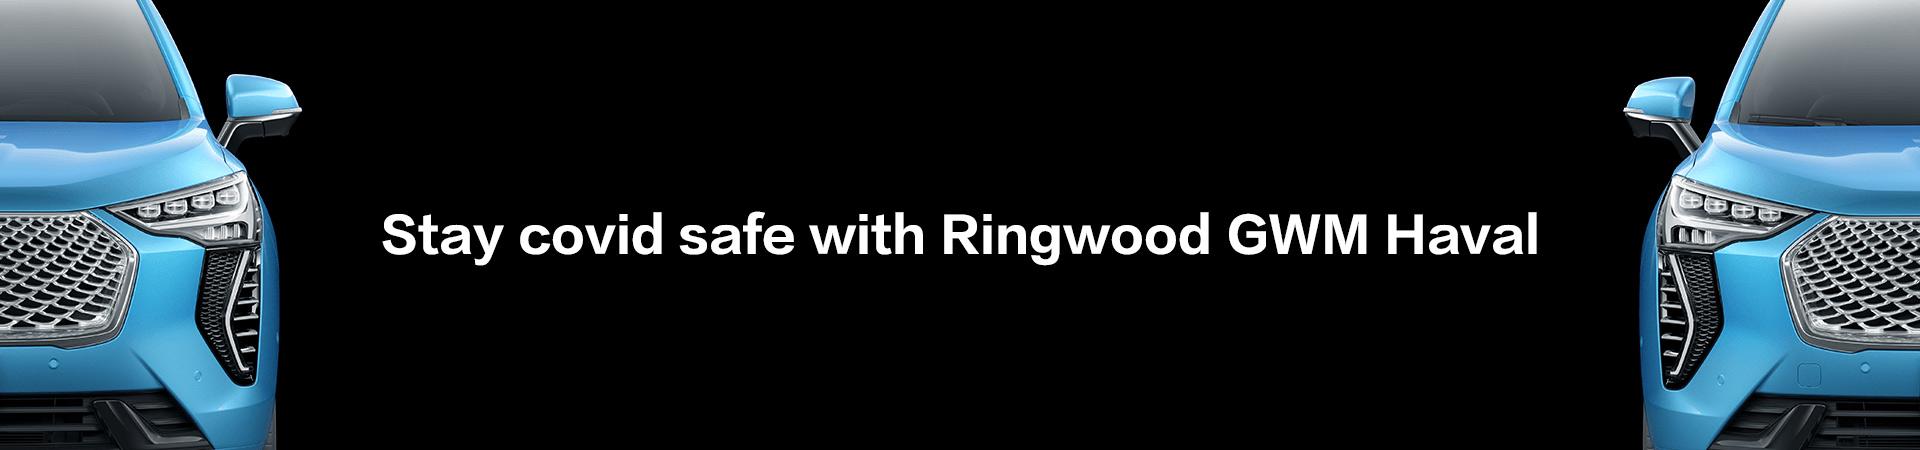 Ringwood GWM HAVAL-Covid Update